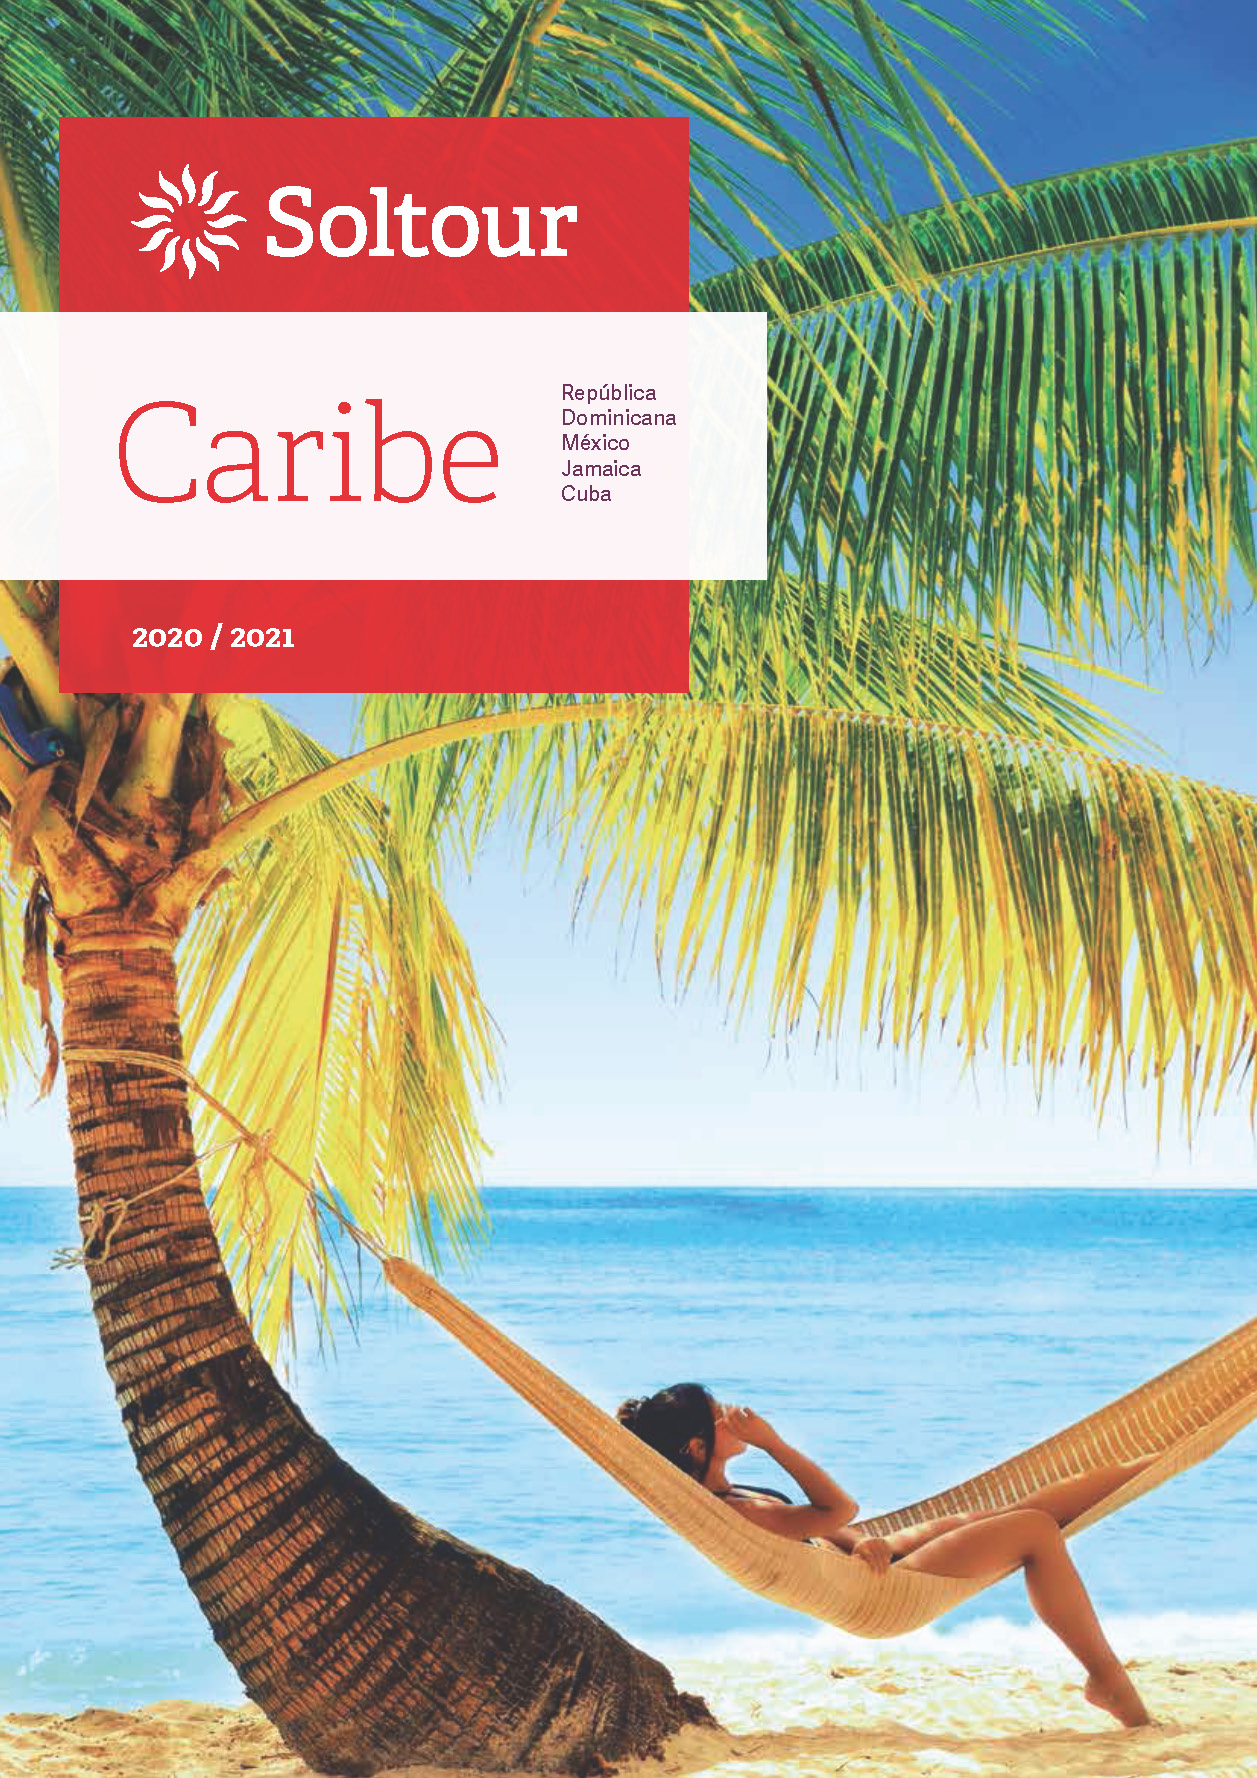 Catalogo Soltour Caribe 2020-2021